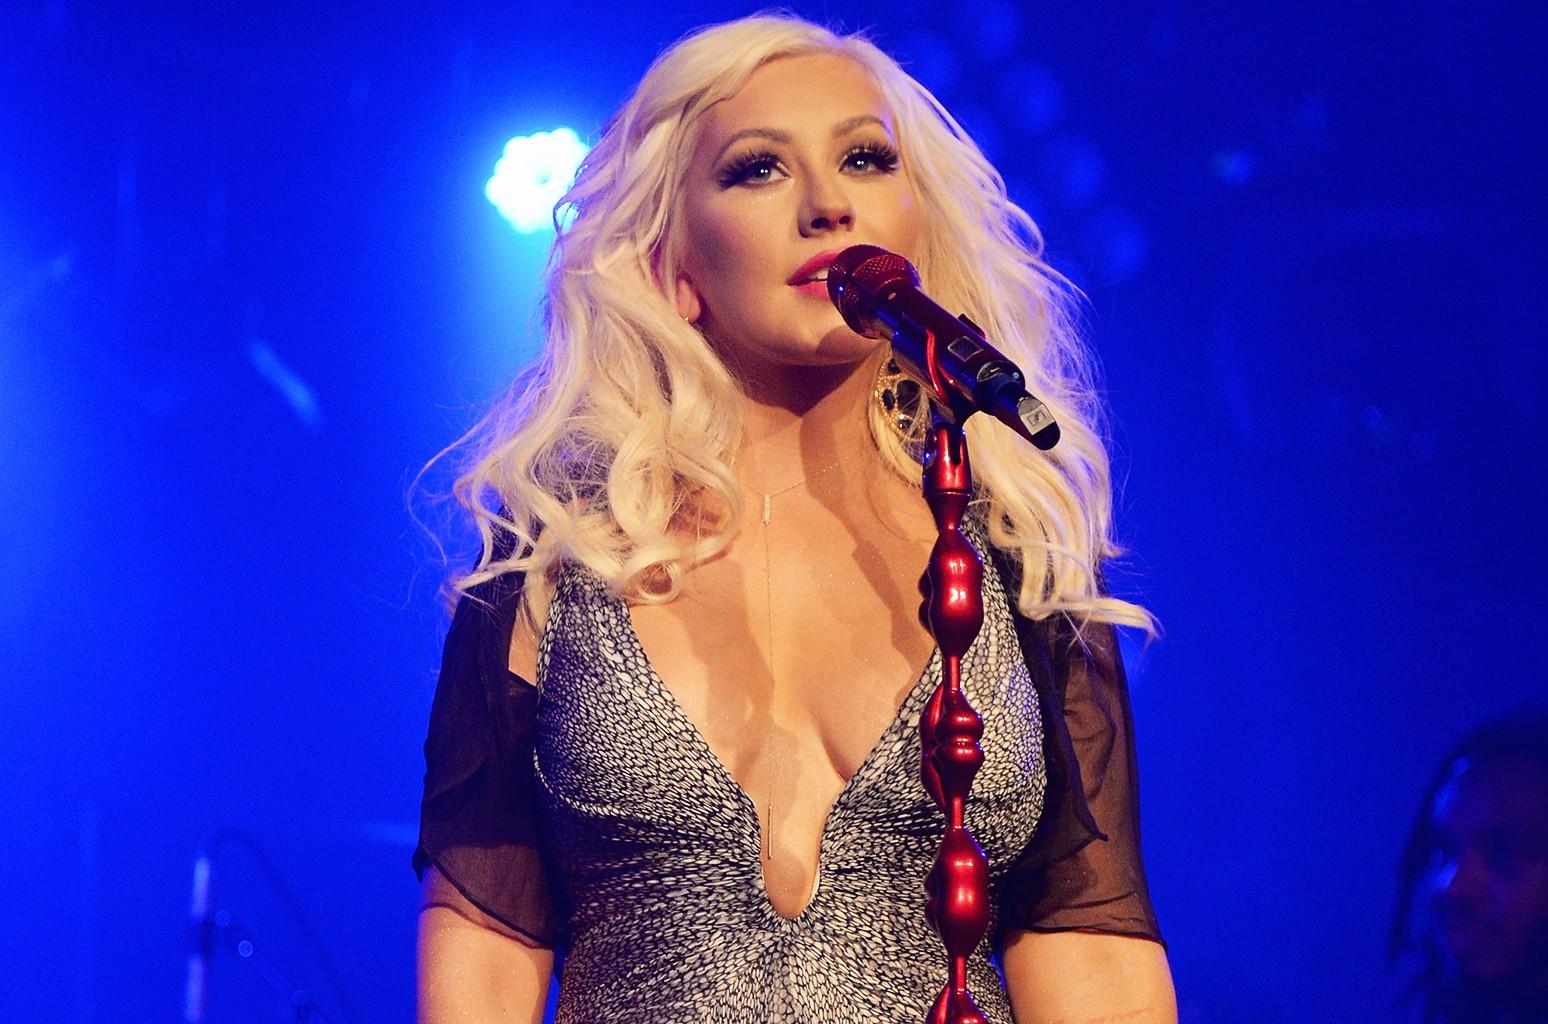 Christina Aguilera performs in New York